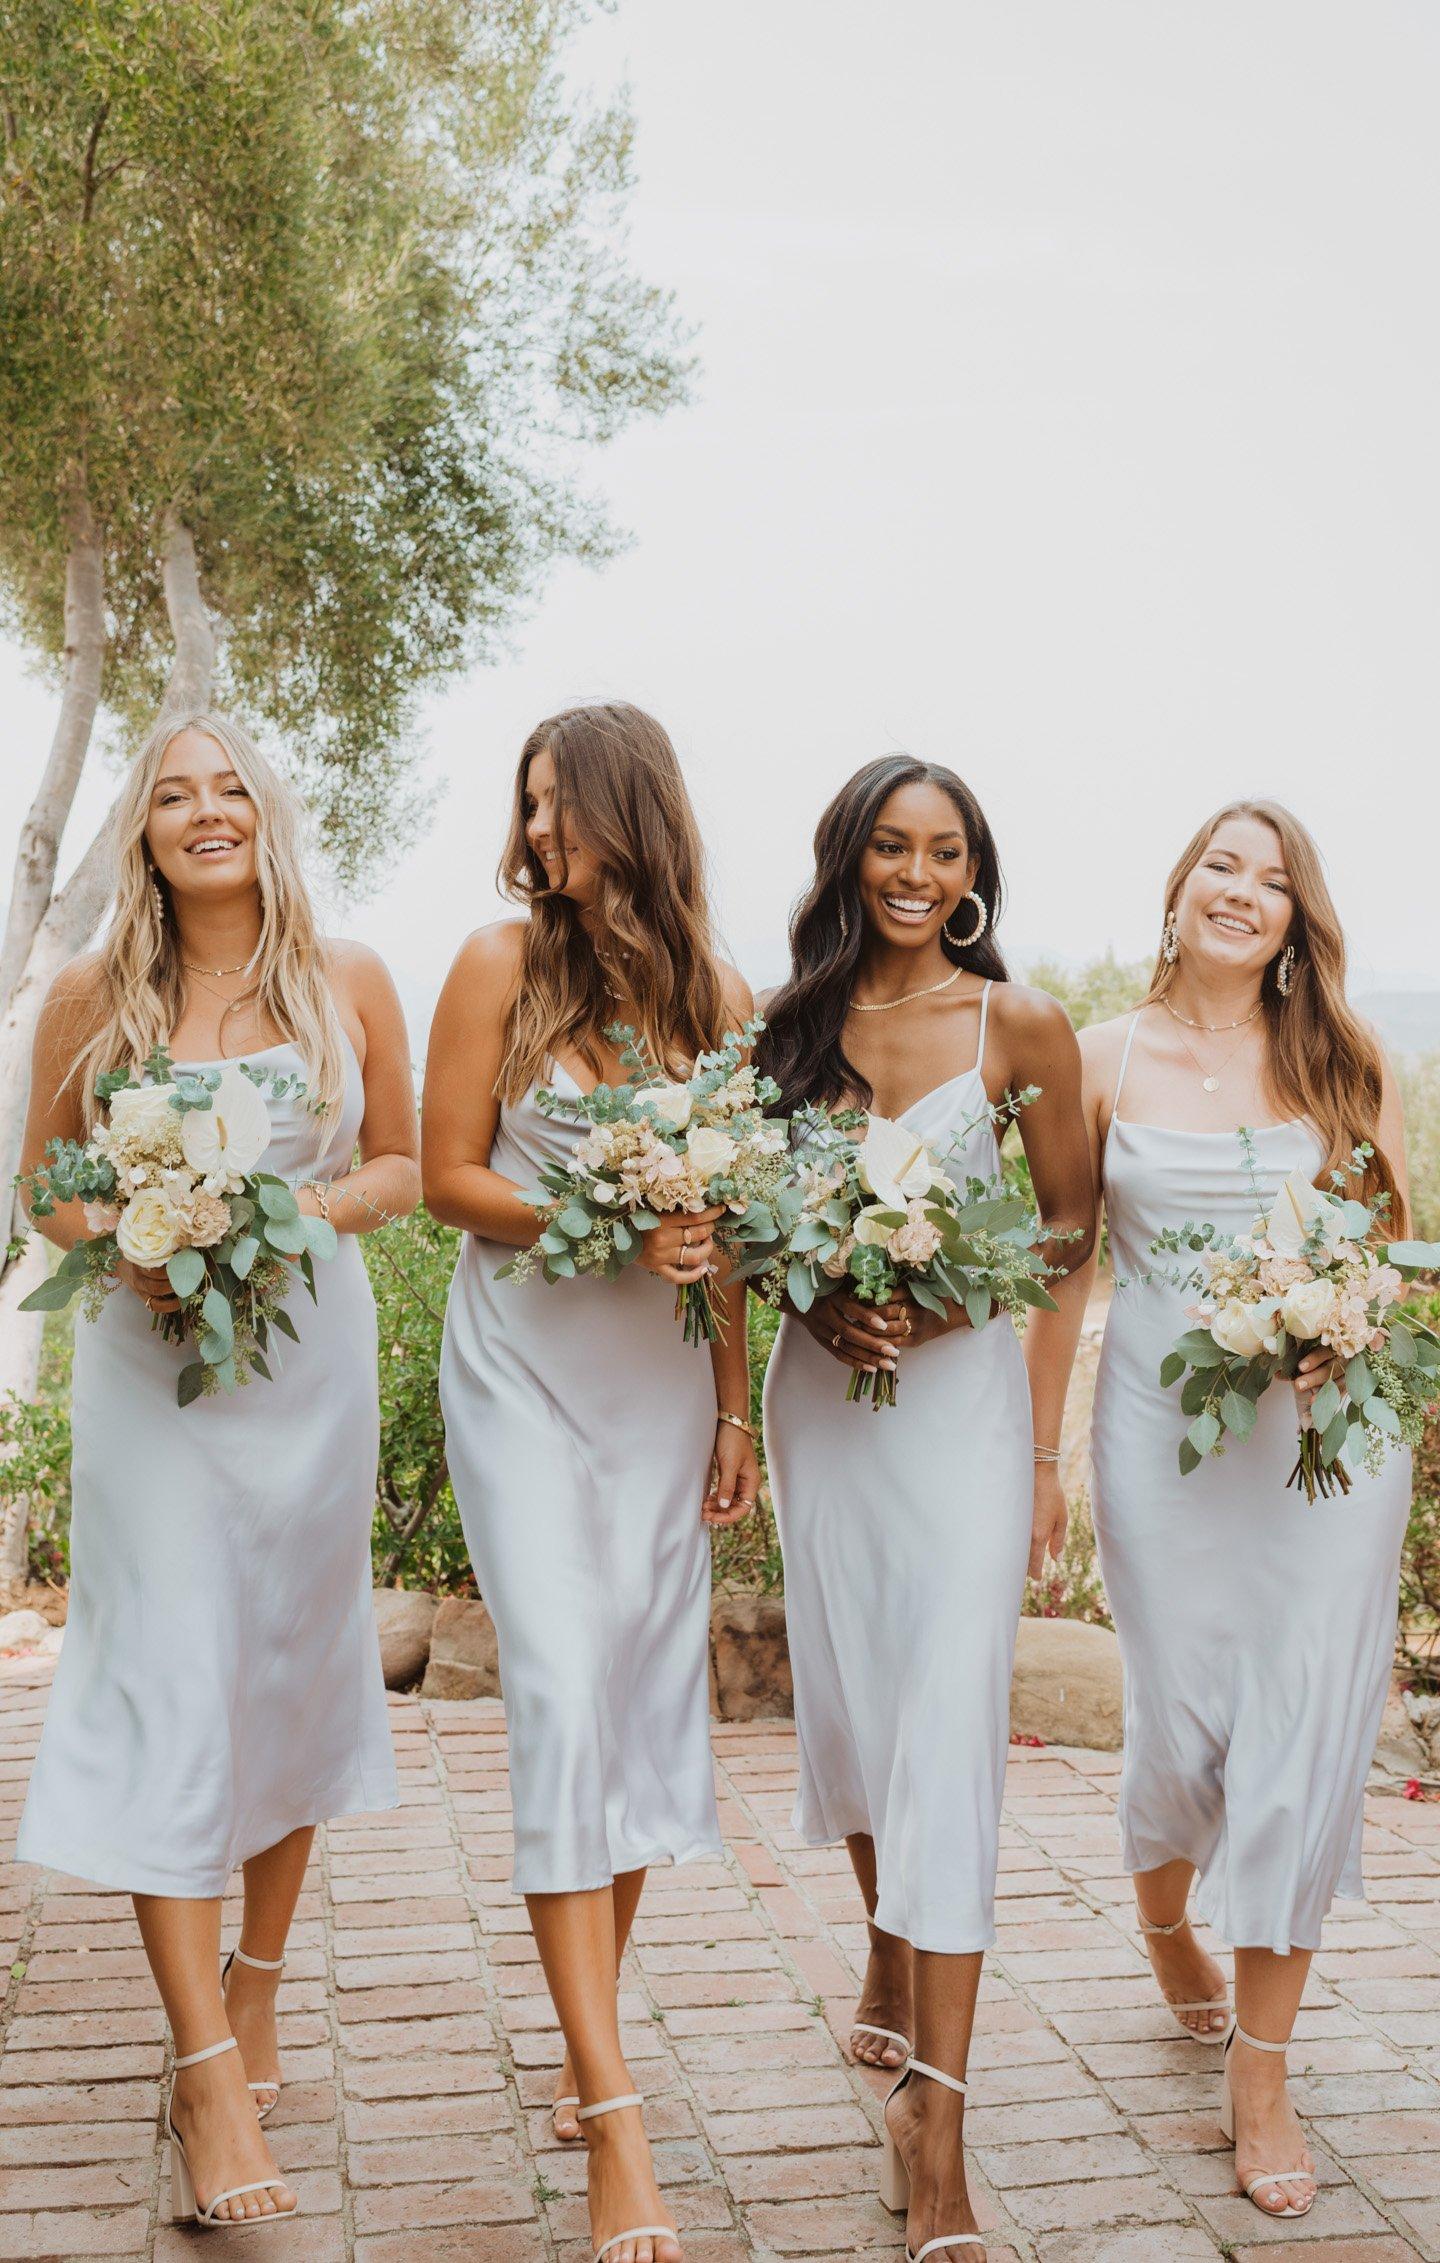 bridesmaid dresses, bridesmaid dress ideas, bridesmaid dress colors, bridesmaid dress styles, blue bridesmaid dress, satin bridesmaid dresses, midi bridesmaid dress